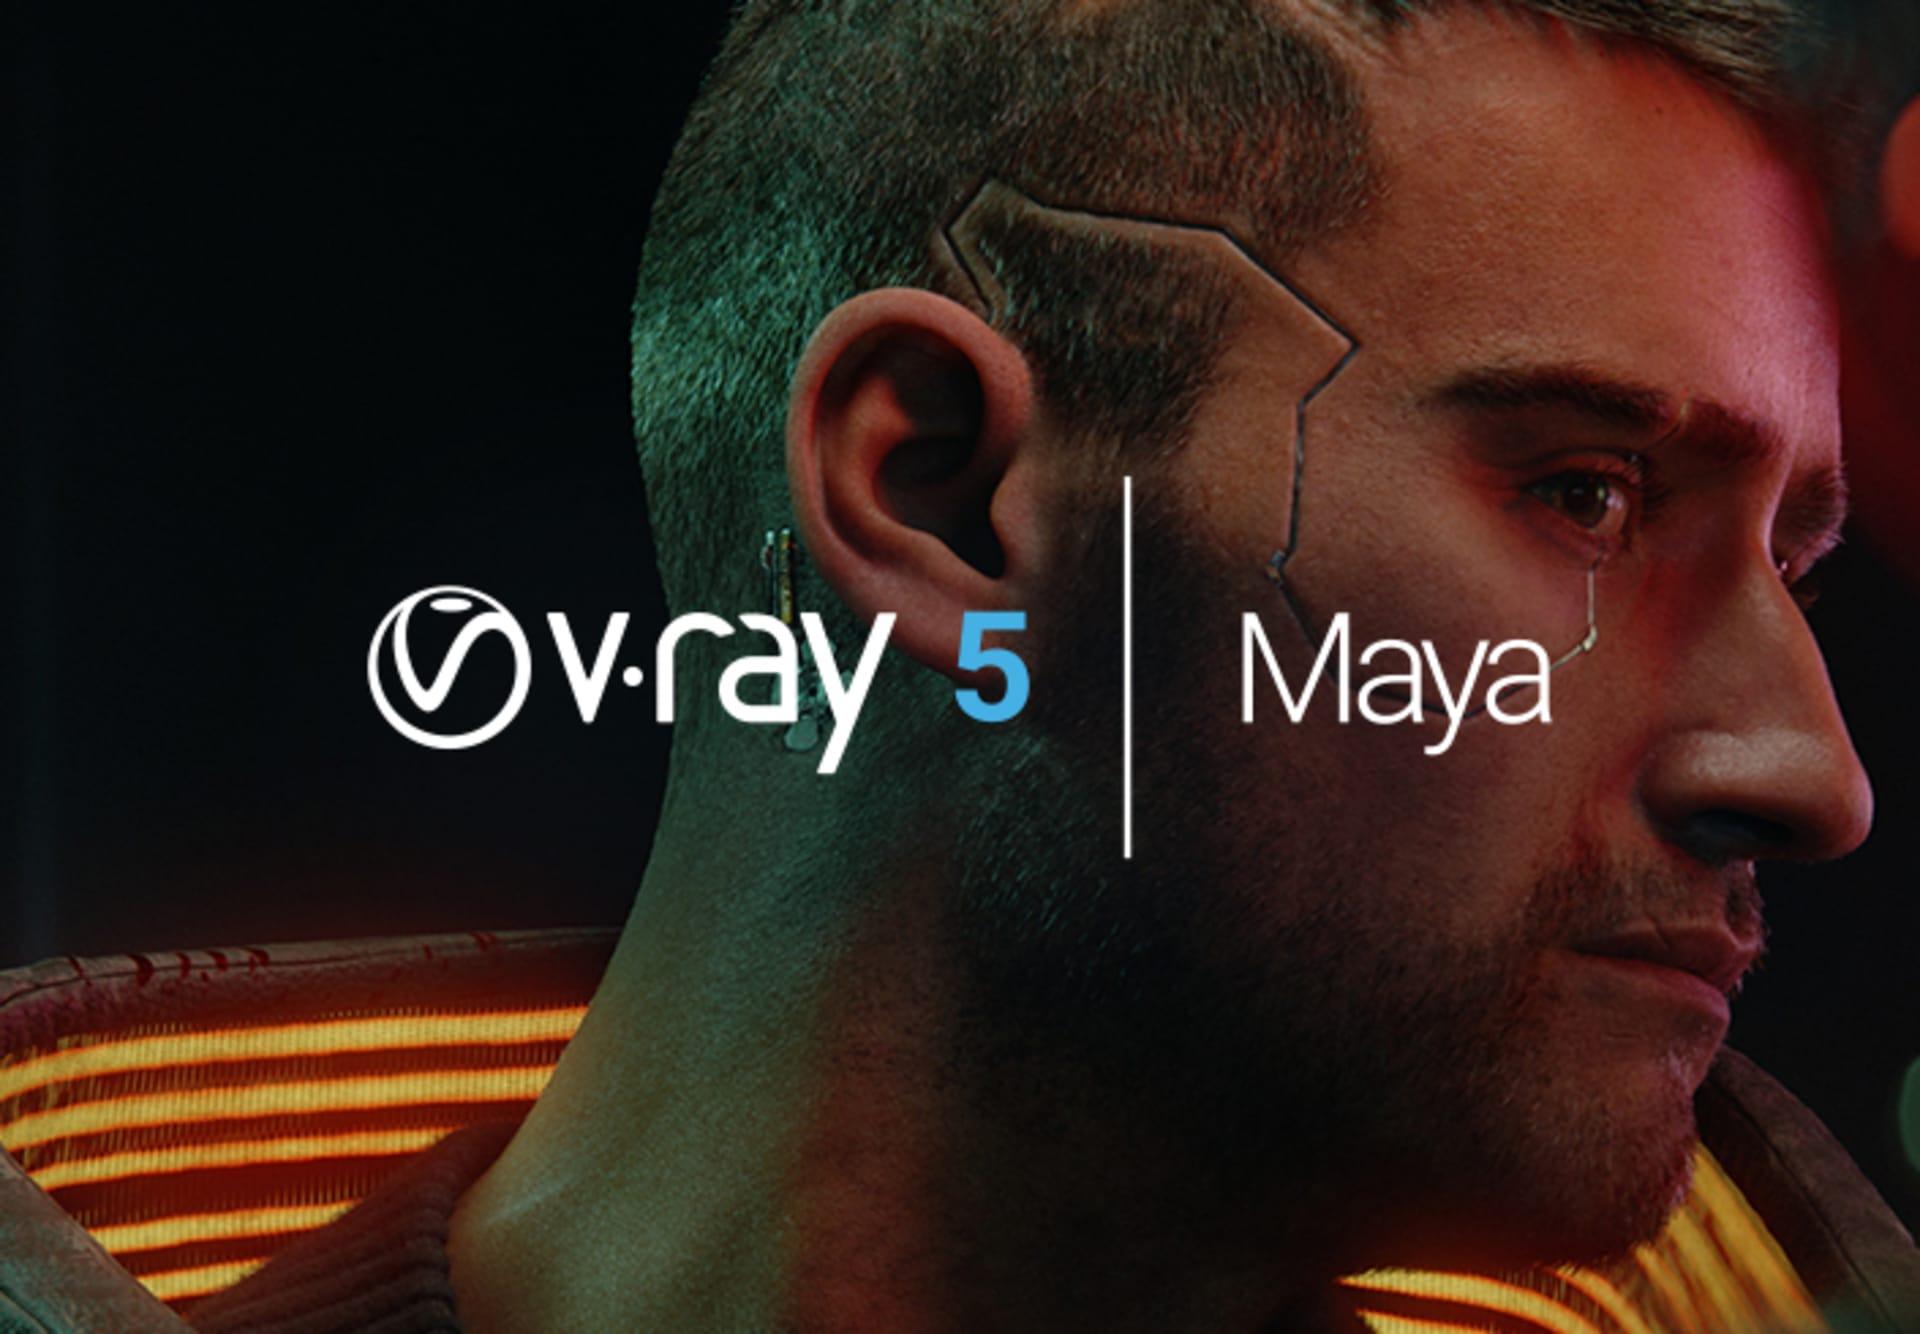 JOIN THE V-RAY 5 FOR MAYA BETA